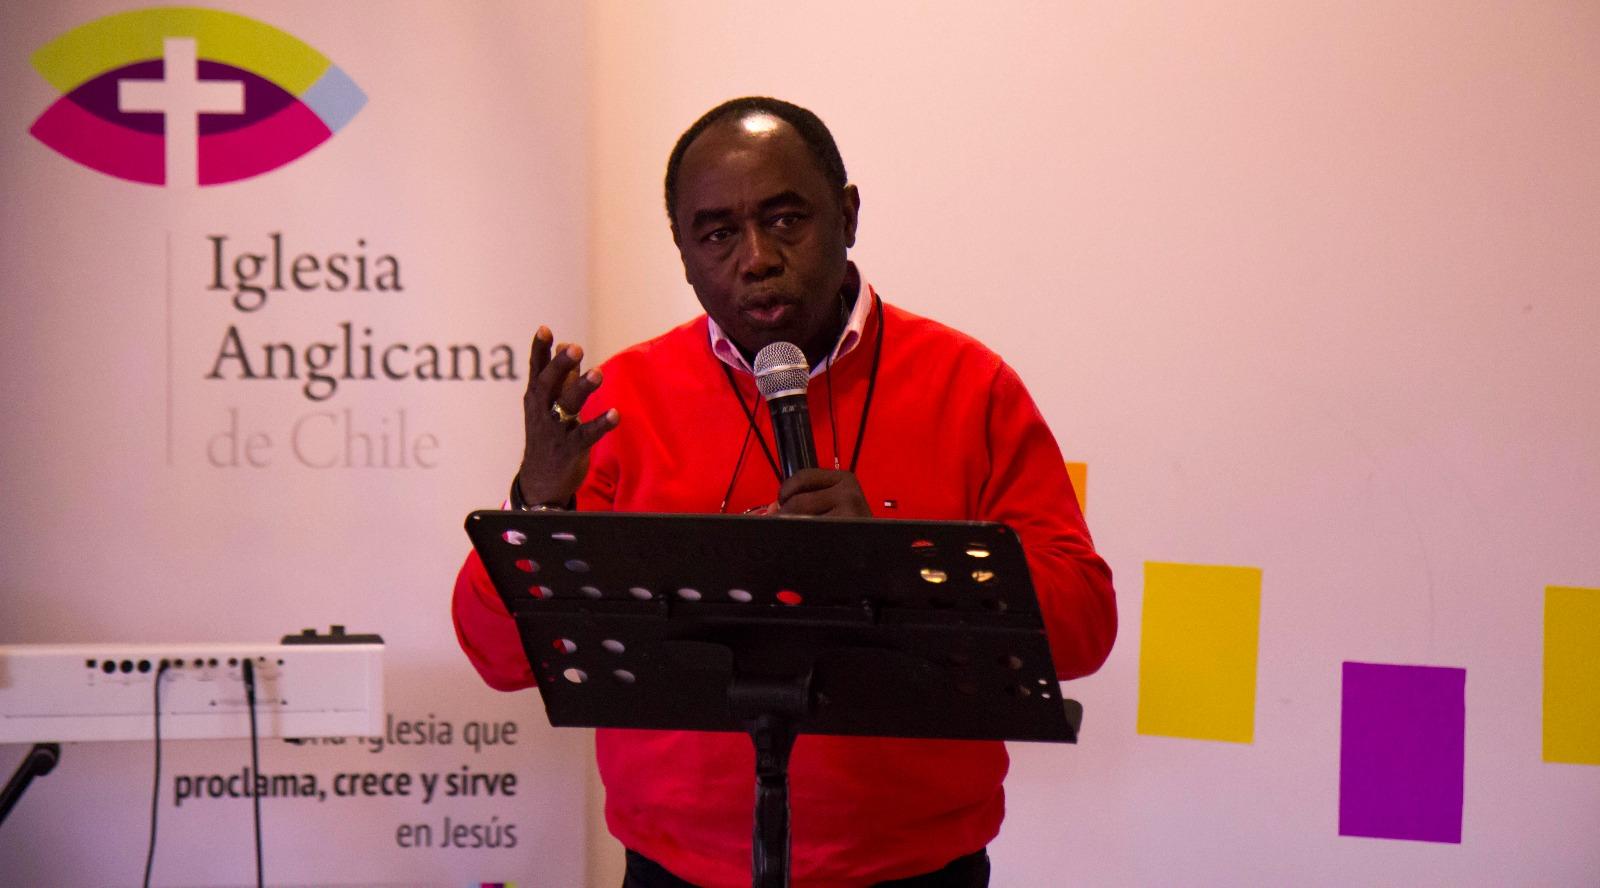 Arzobispo Benjamin Kwashi de Jos, Nigeria